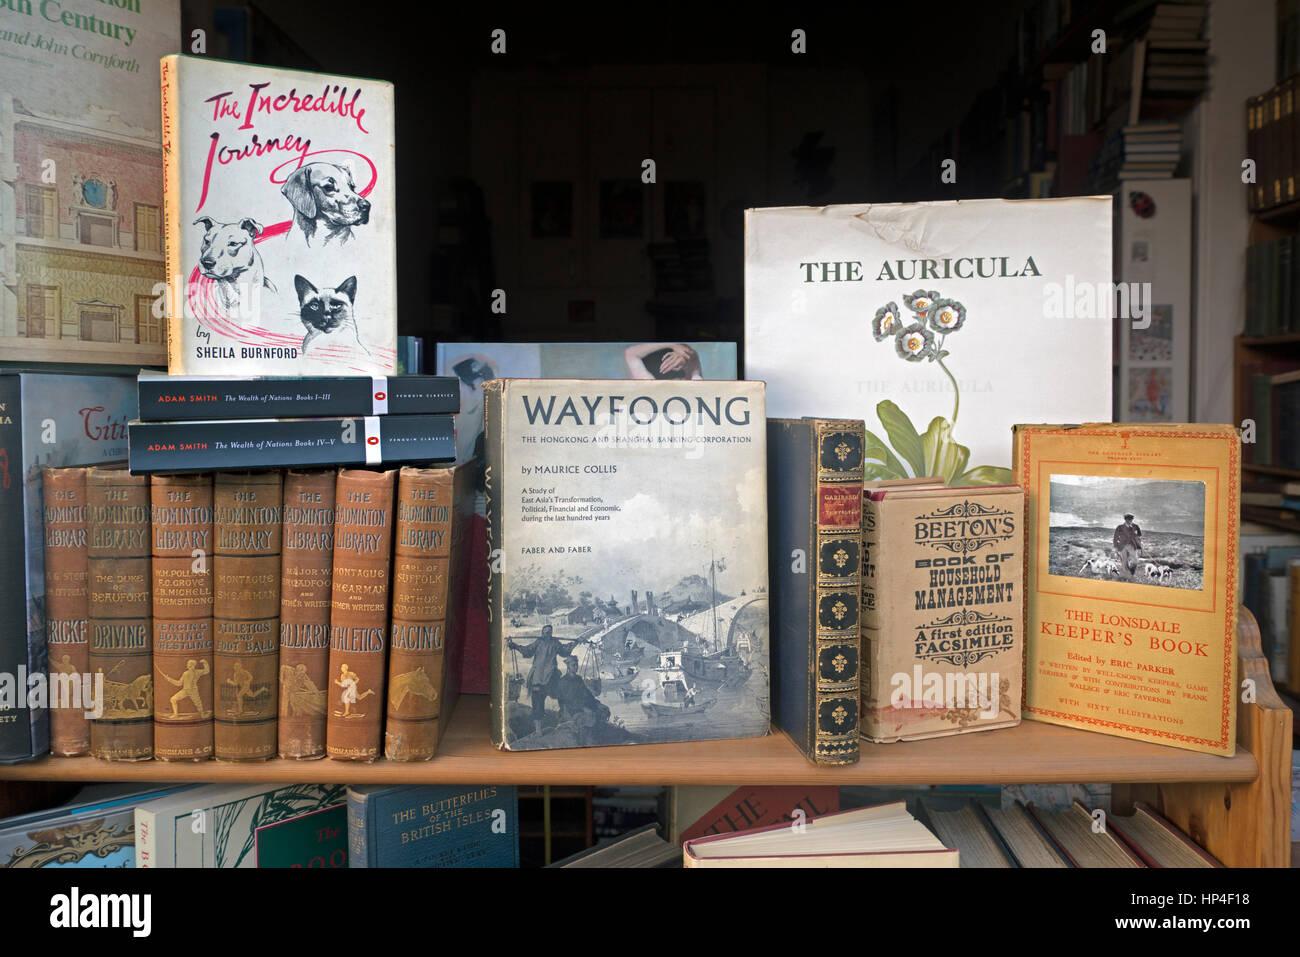 Vintage books for sale in a secondhand bookshop in Edinburgh, Scotland, UK - Stock Image